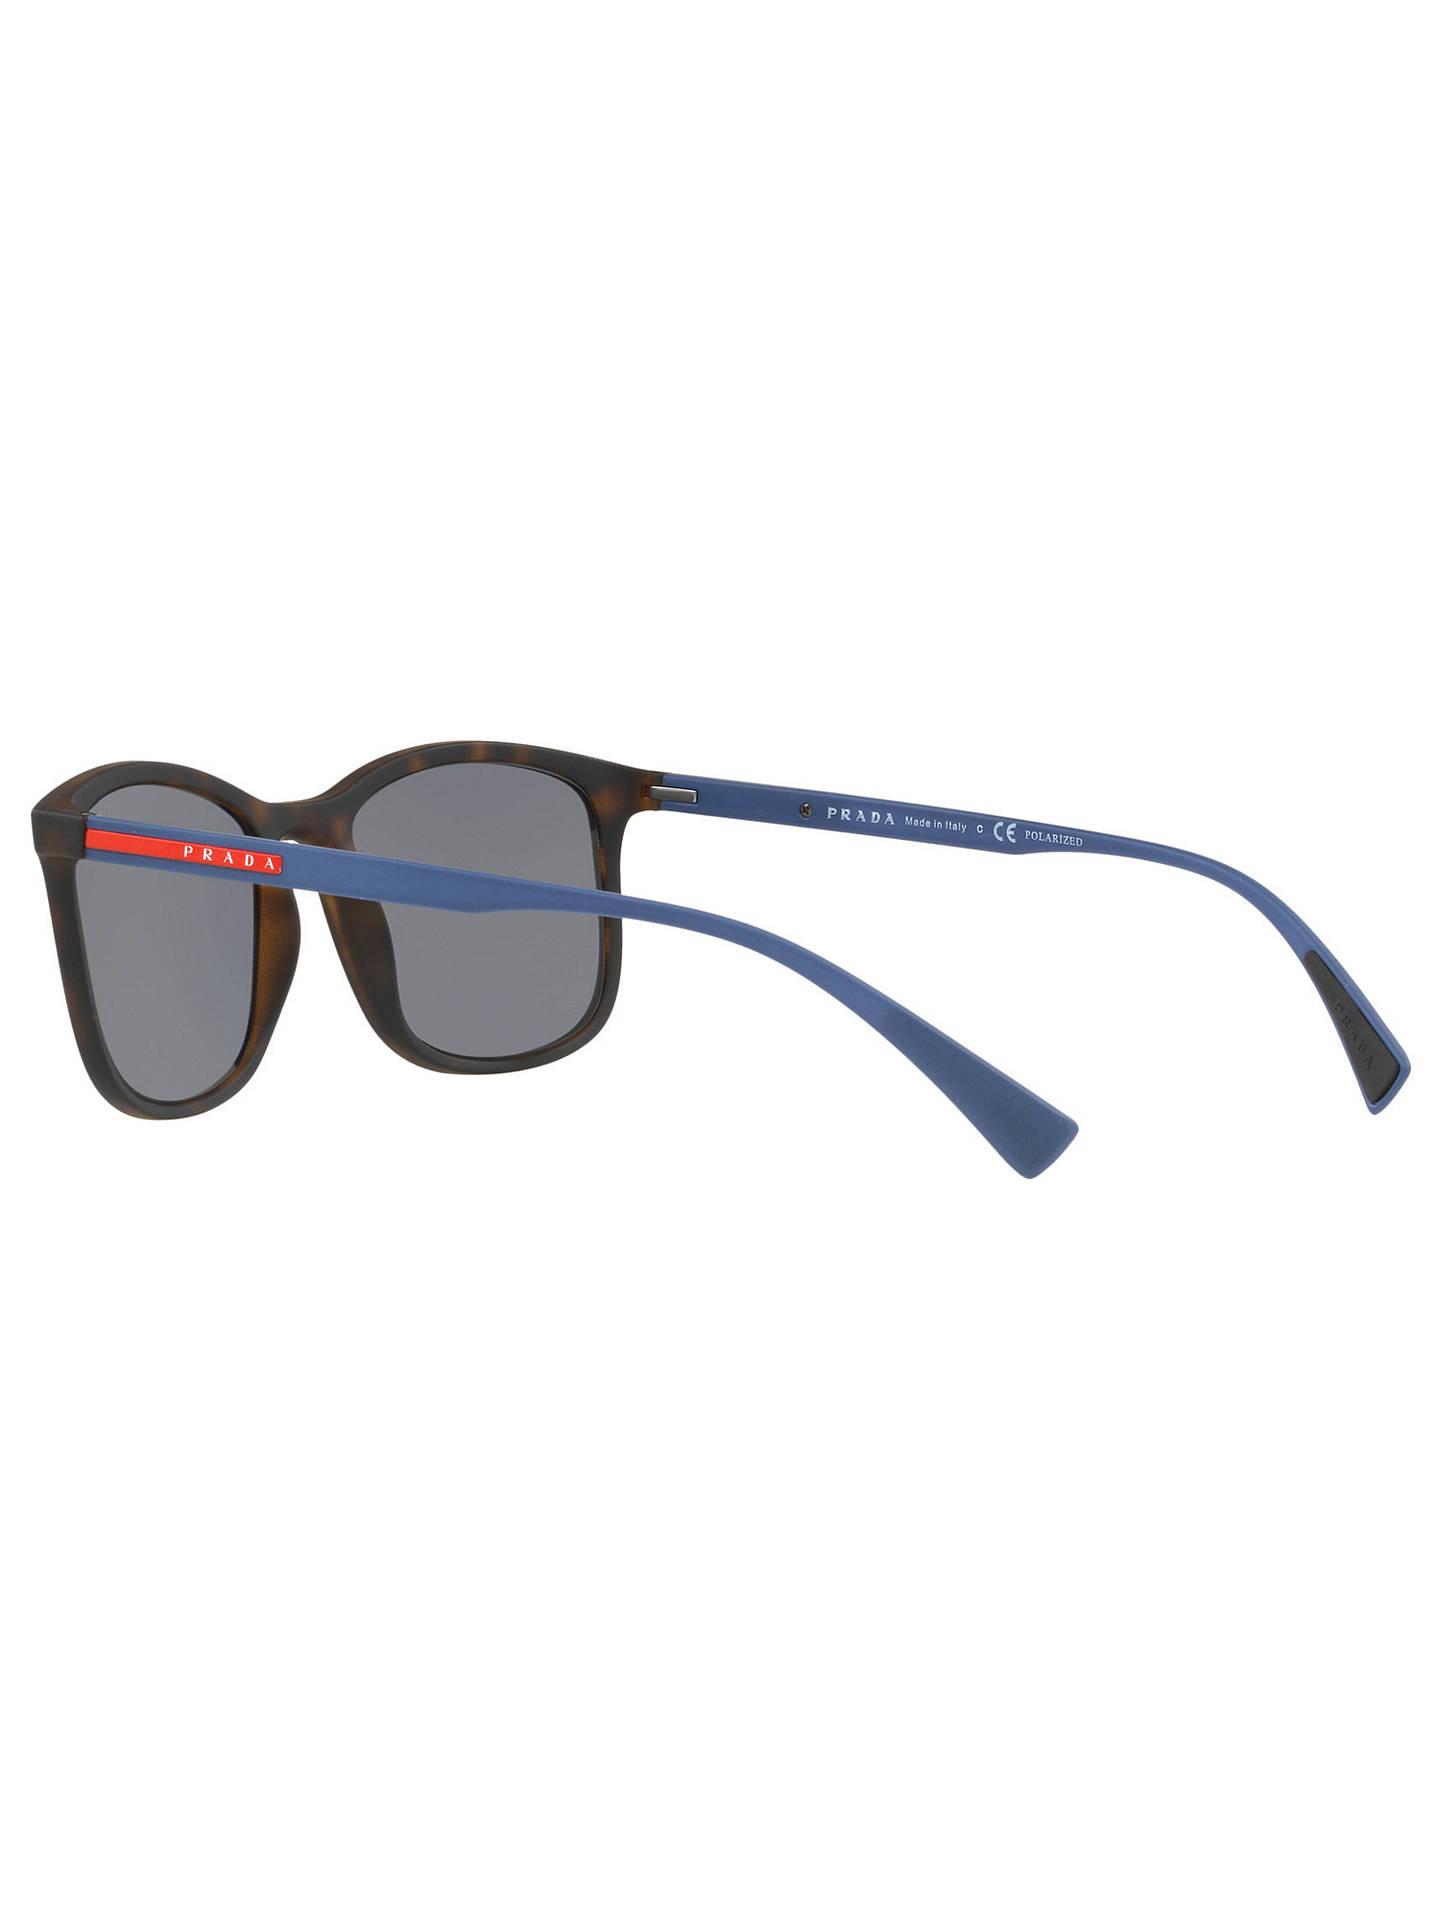 77da2f40e1ba0 ... Buy Prada Linea Rossa PS 01TS Men s Polarised Rectangular Sunglasses